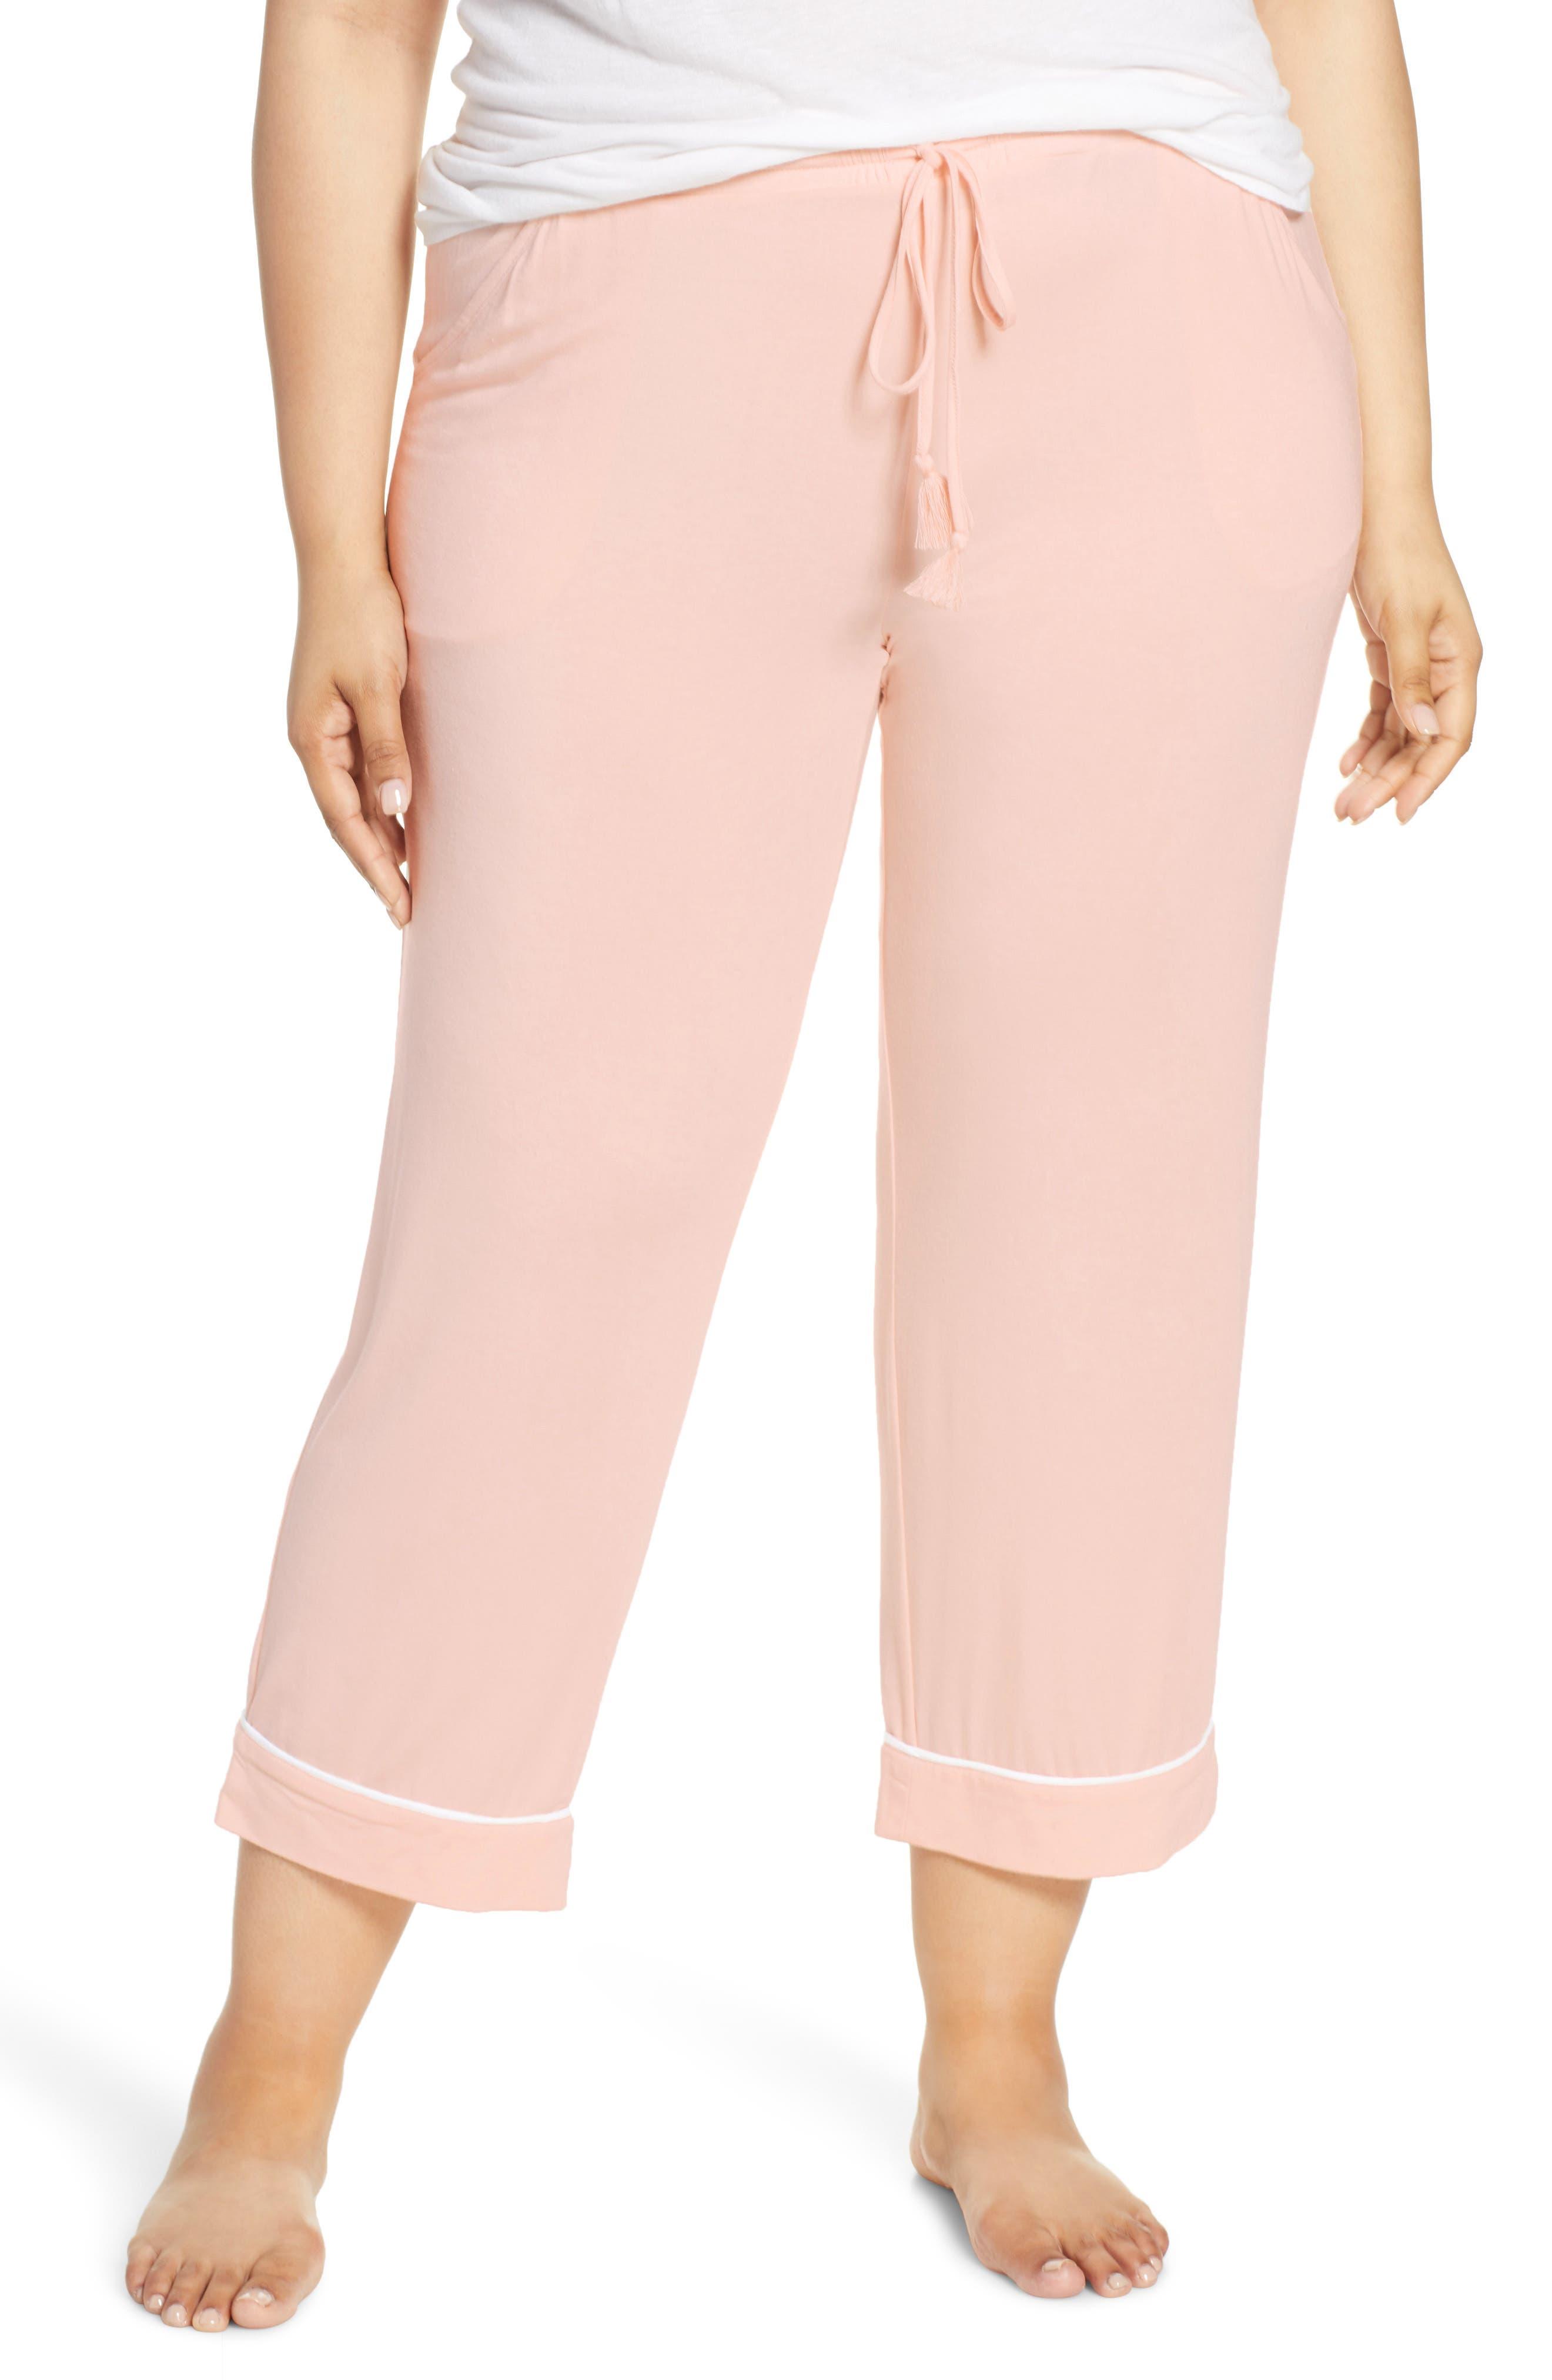 Plus Size Nordstrom Lingerie Moonlight Crop Pajama Pants, Pink